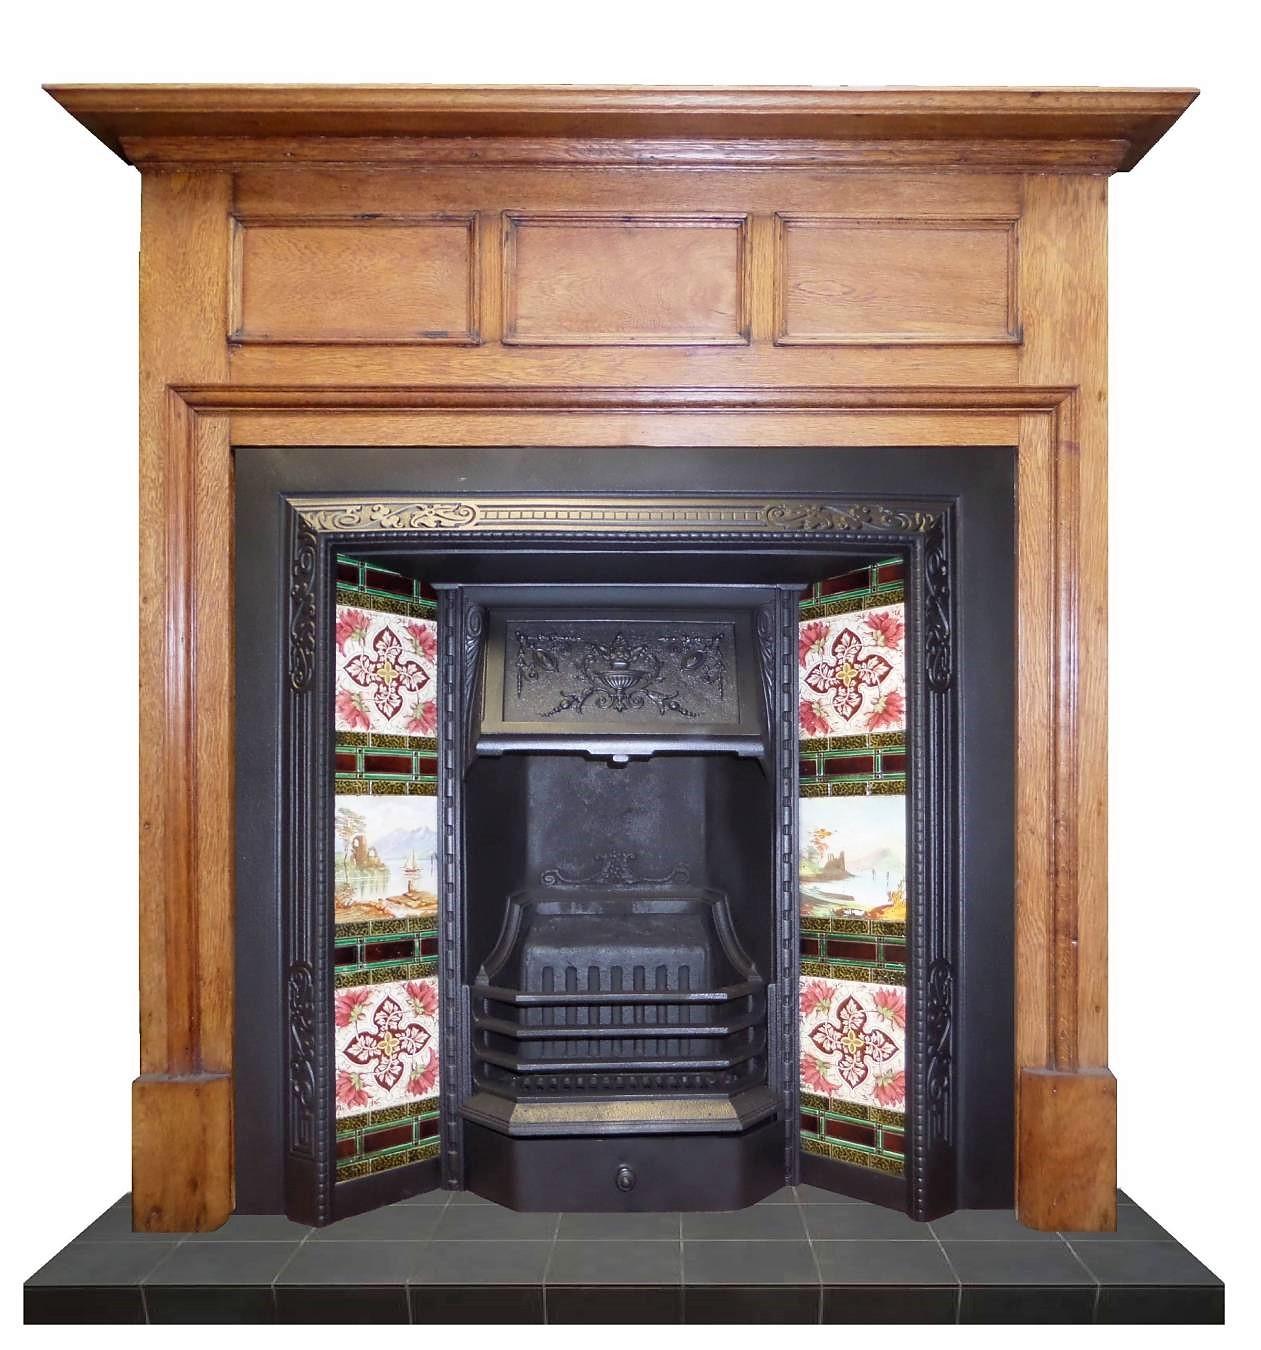 Buy Online Antique Victorian Cast Iron Fireplace Insert